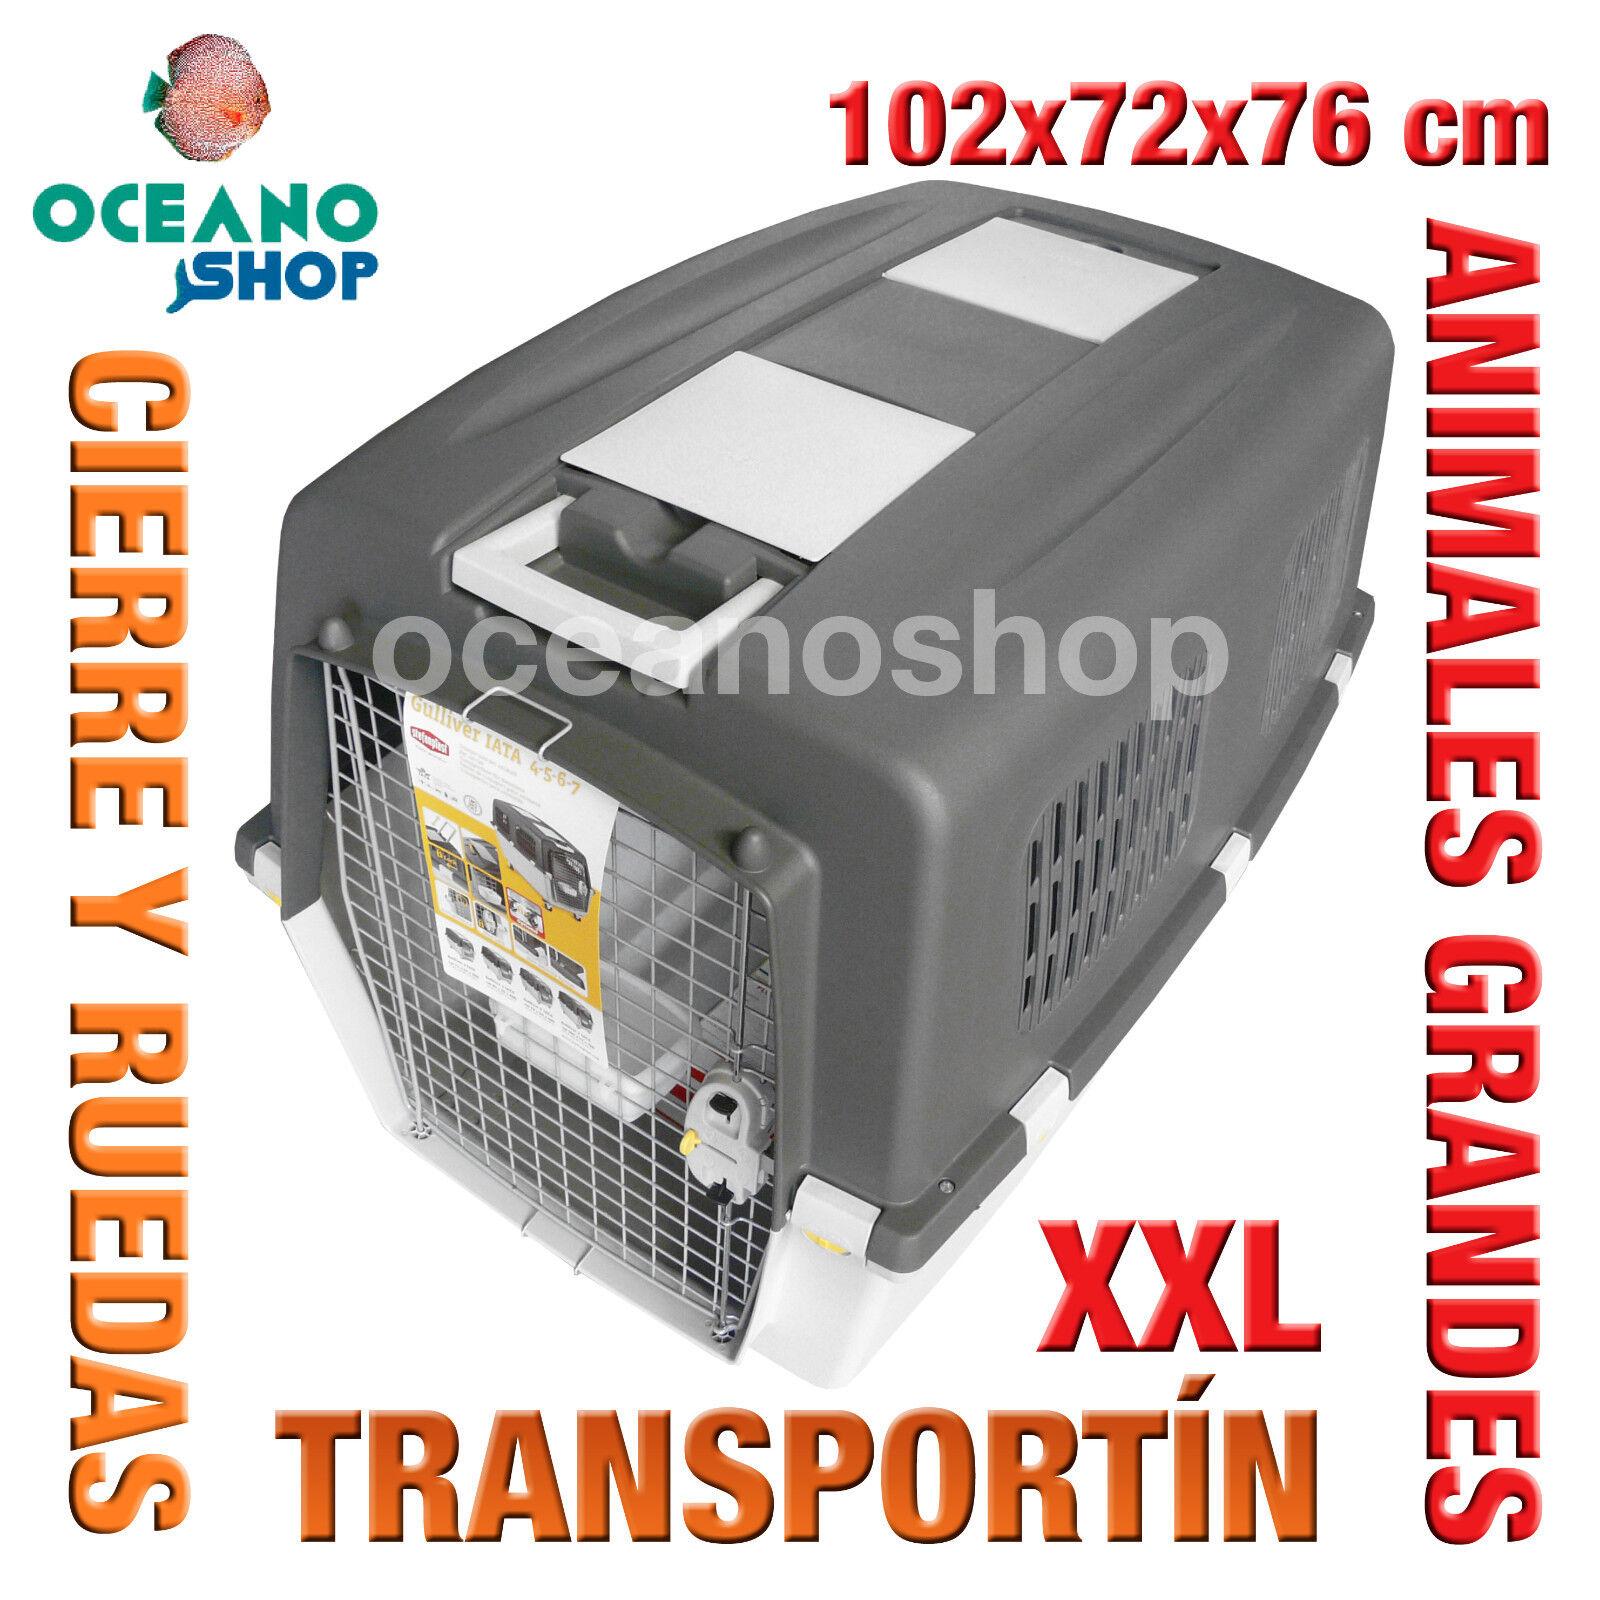 TRANSPORTIN ANIMALES GRANDES XXL RUEDAS CIERRE SEG Y ASA 102x72x76 cm L551...